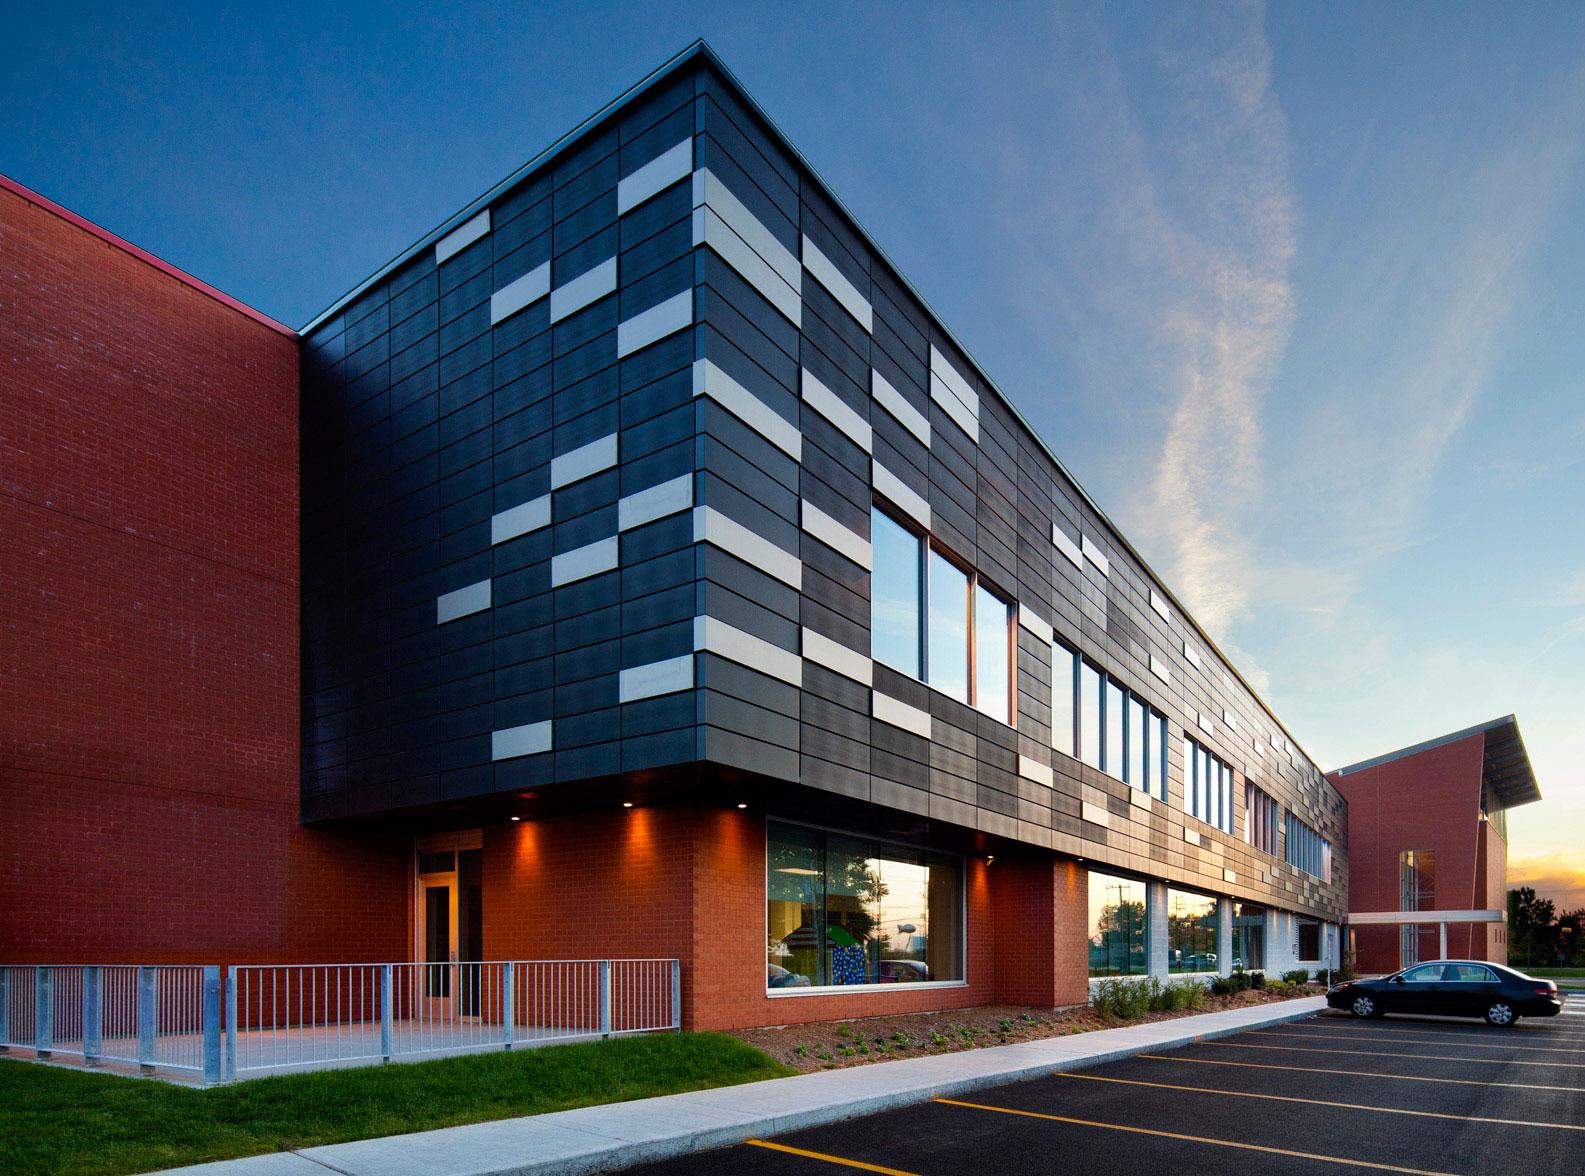 Aquatic and Community Centre